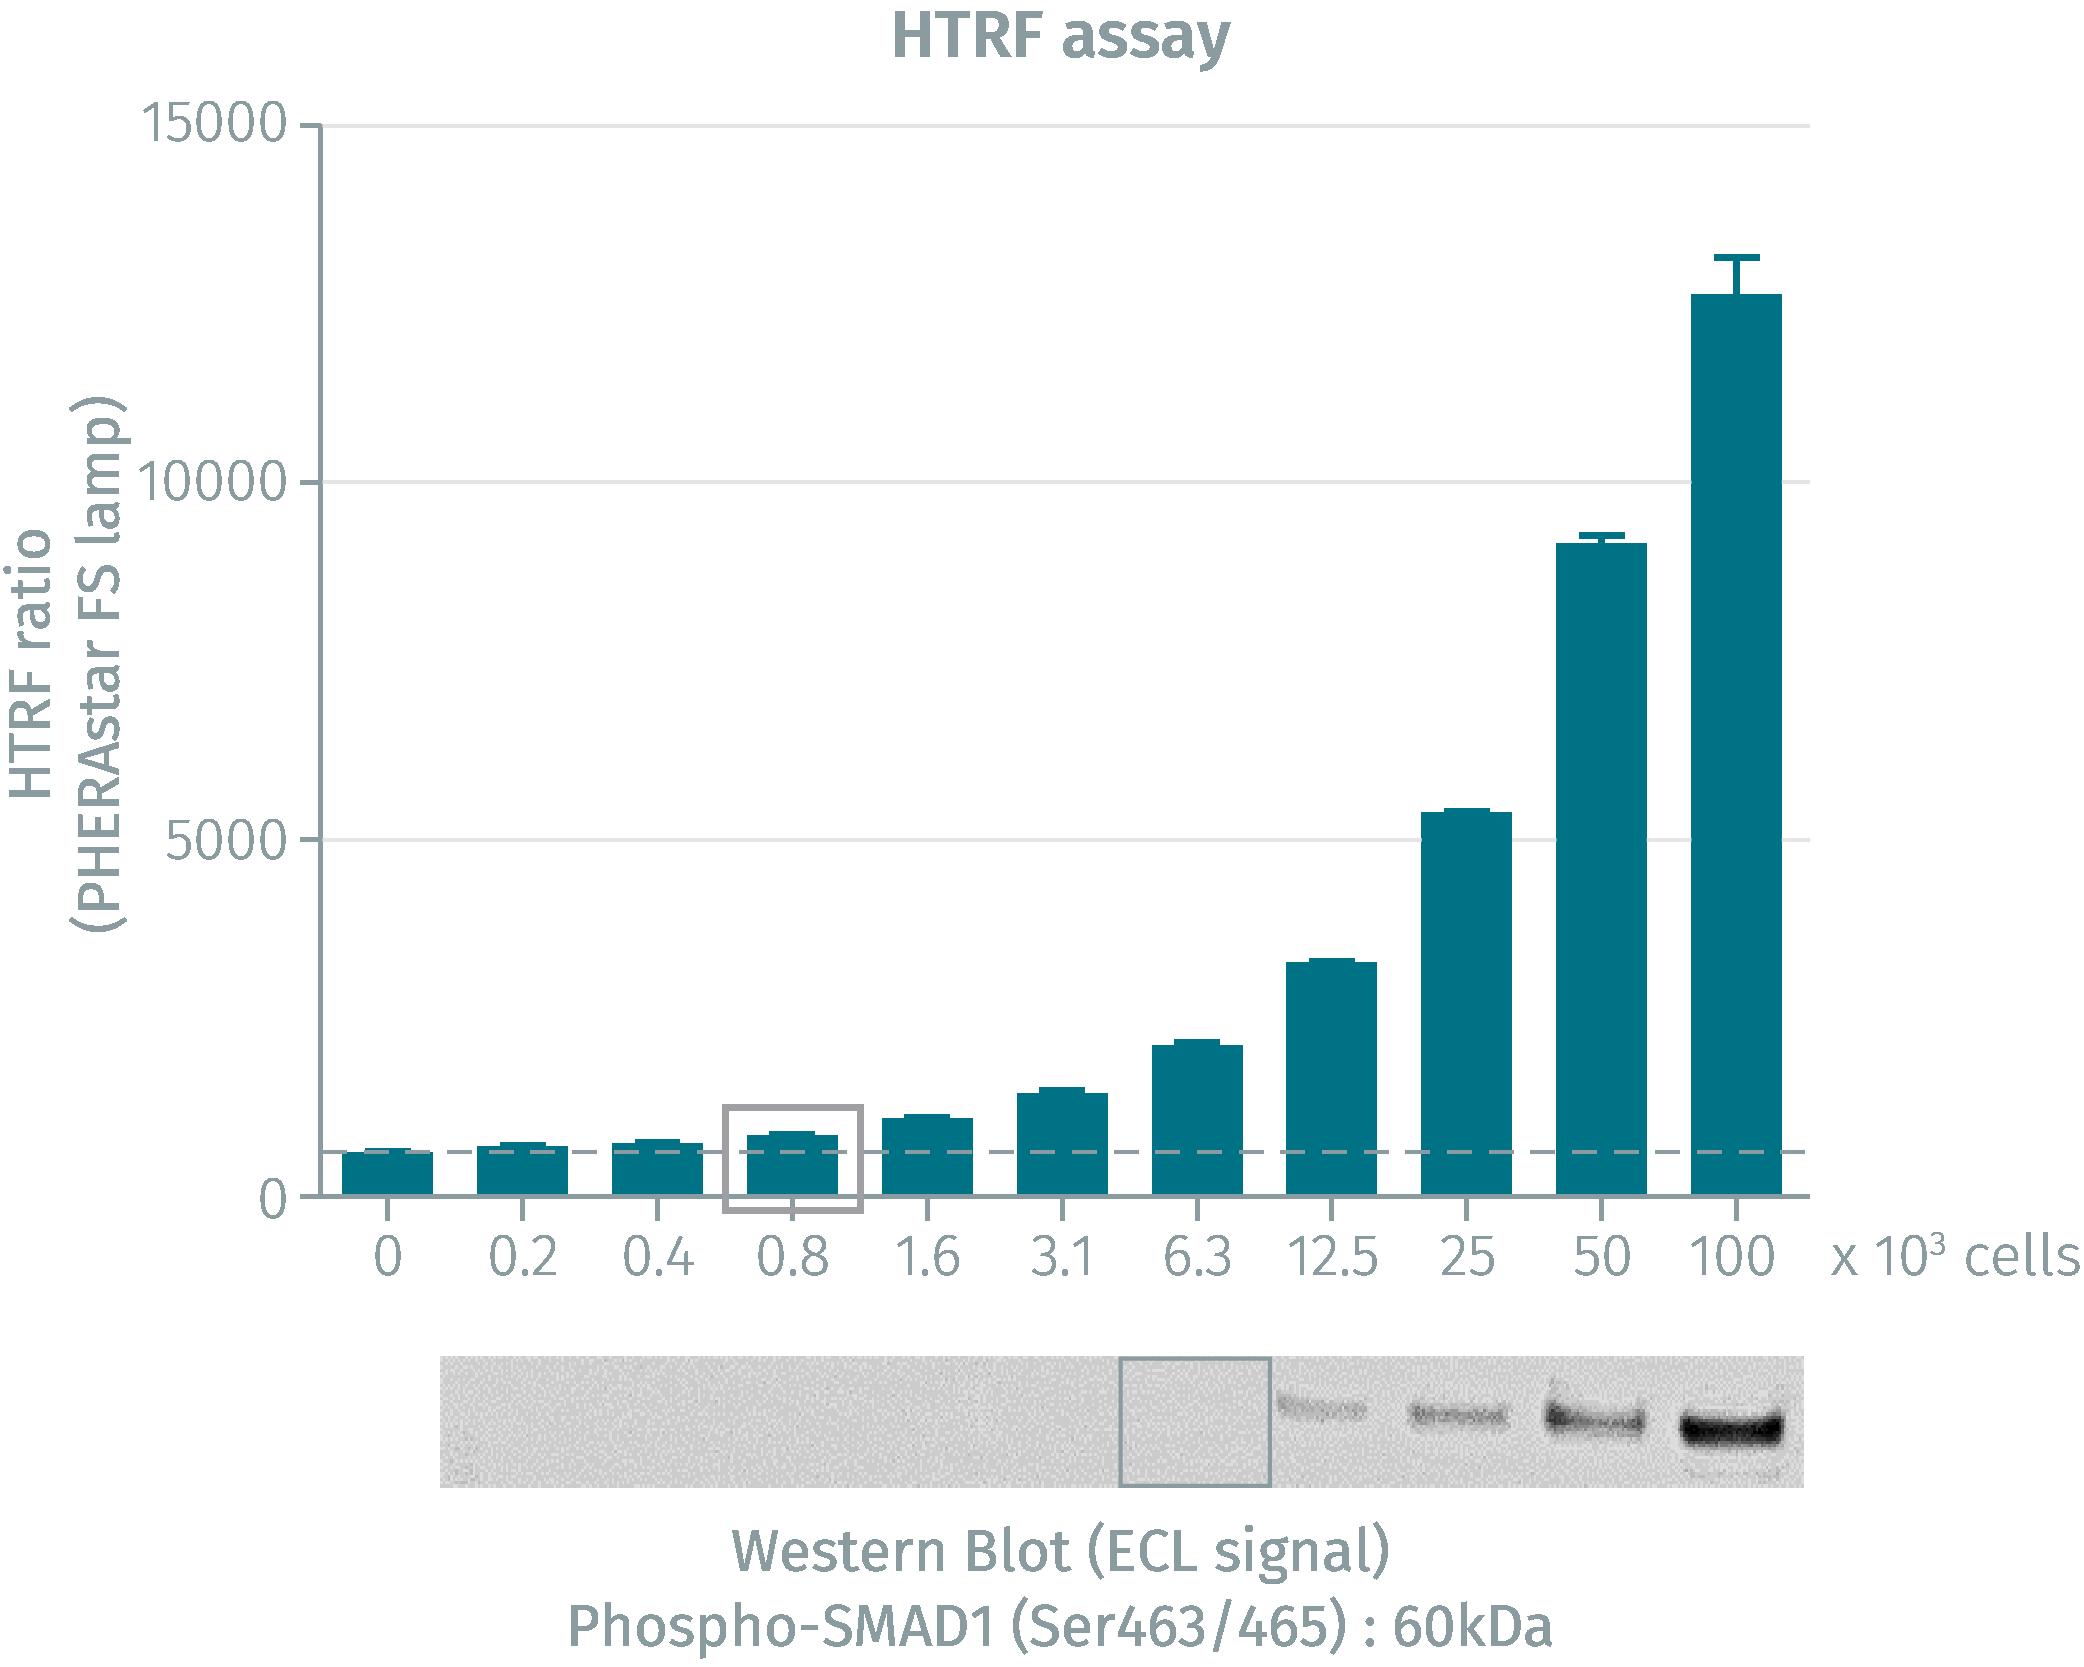 HTRF assay compared to Western Blot using total SLP-76 cellular assays on human Jurkat cells